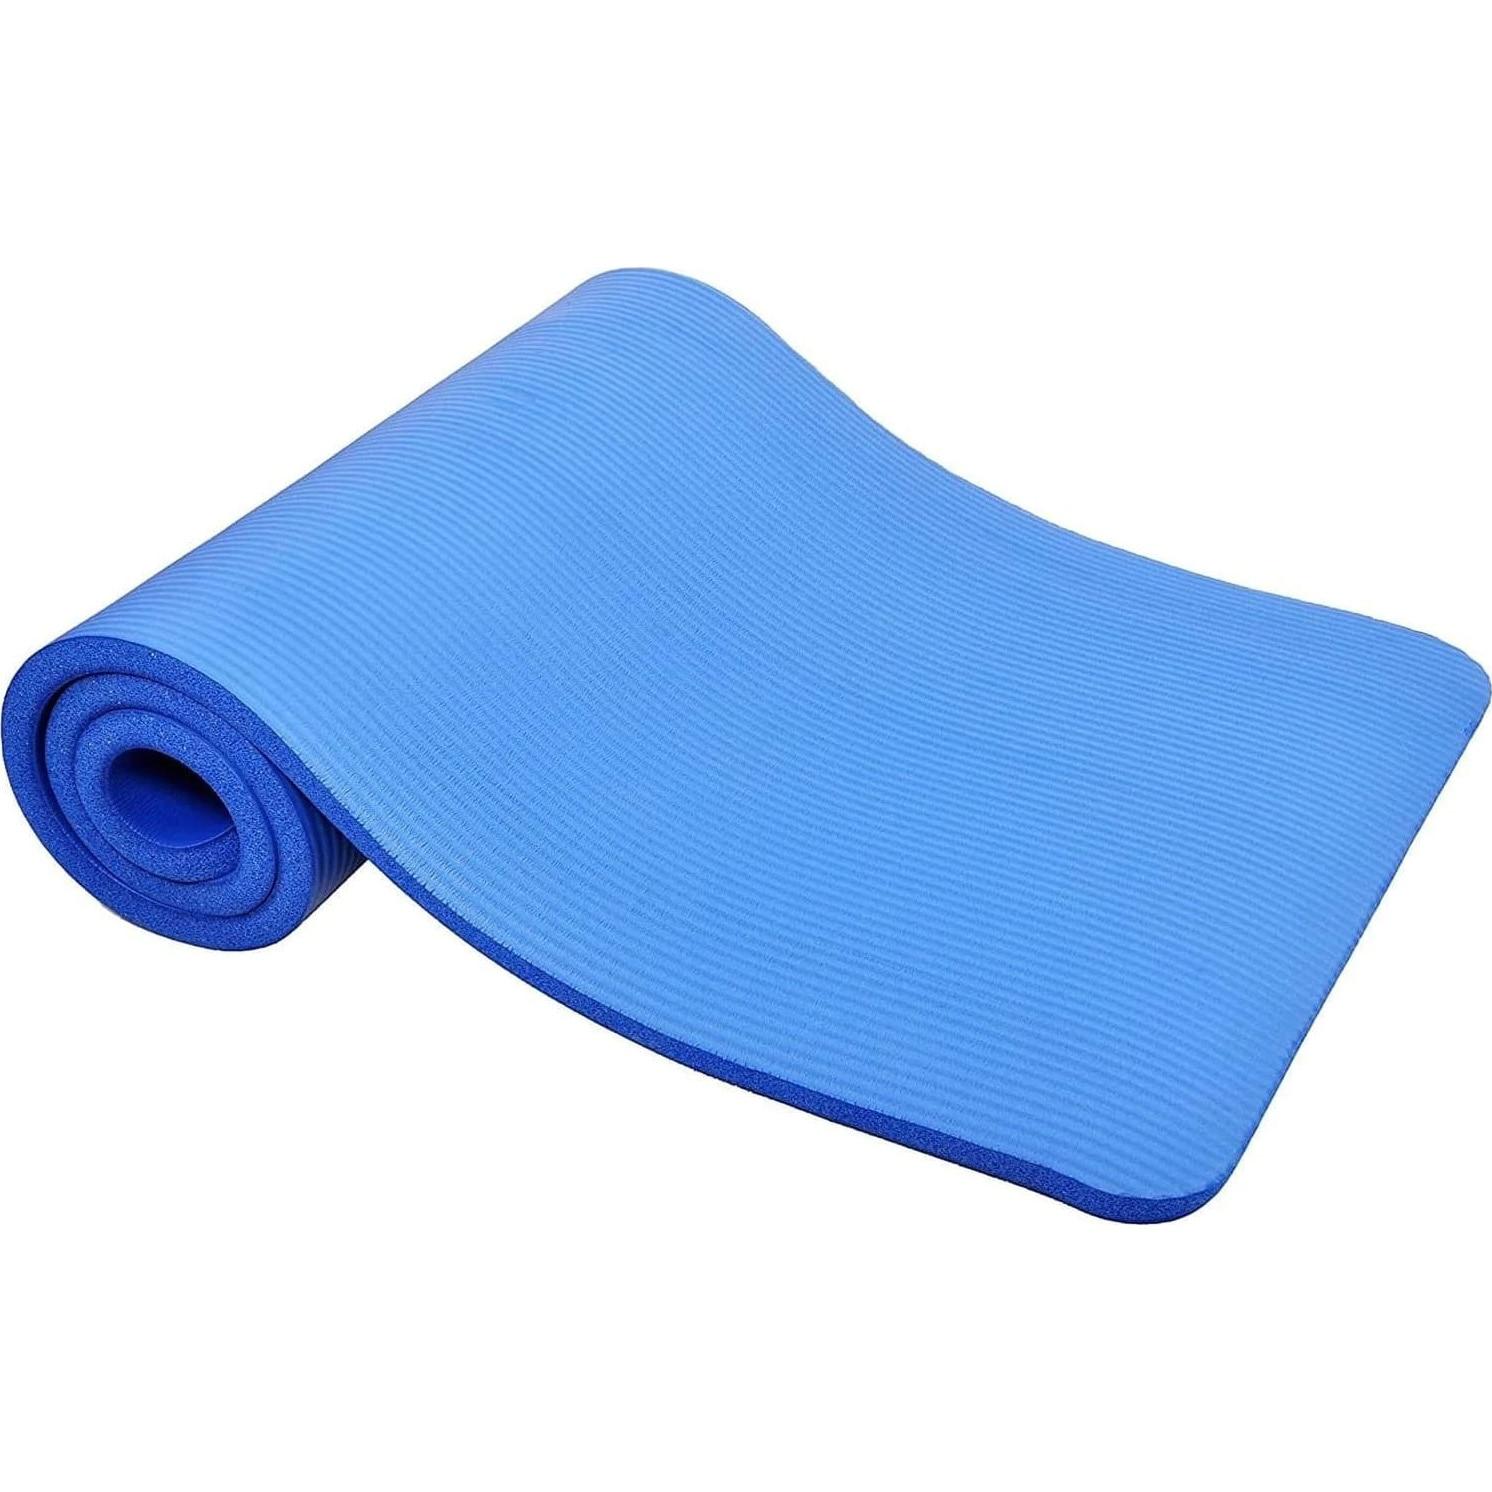 Fotografie Saltea fitness/yoga/pilates Techfit, 180x60x1cm, albastru